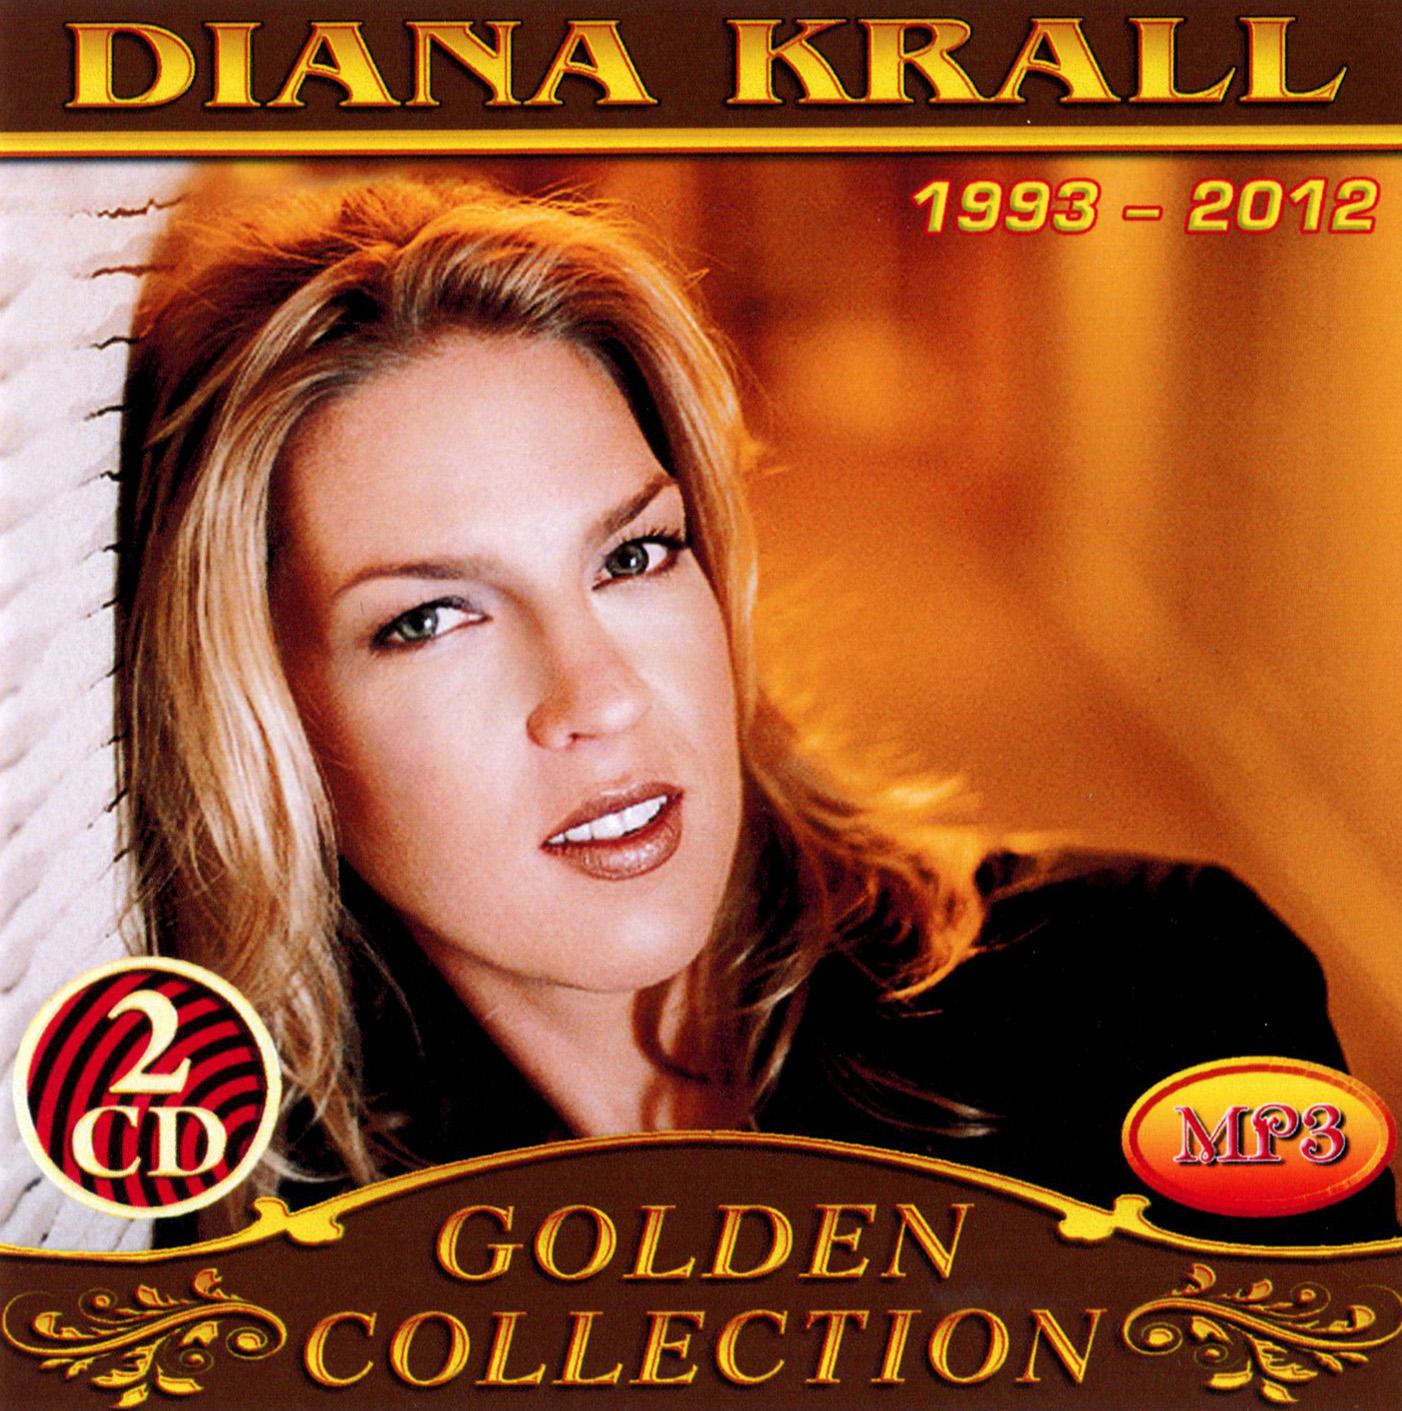 Diana Krall 2cd [mp3]